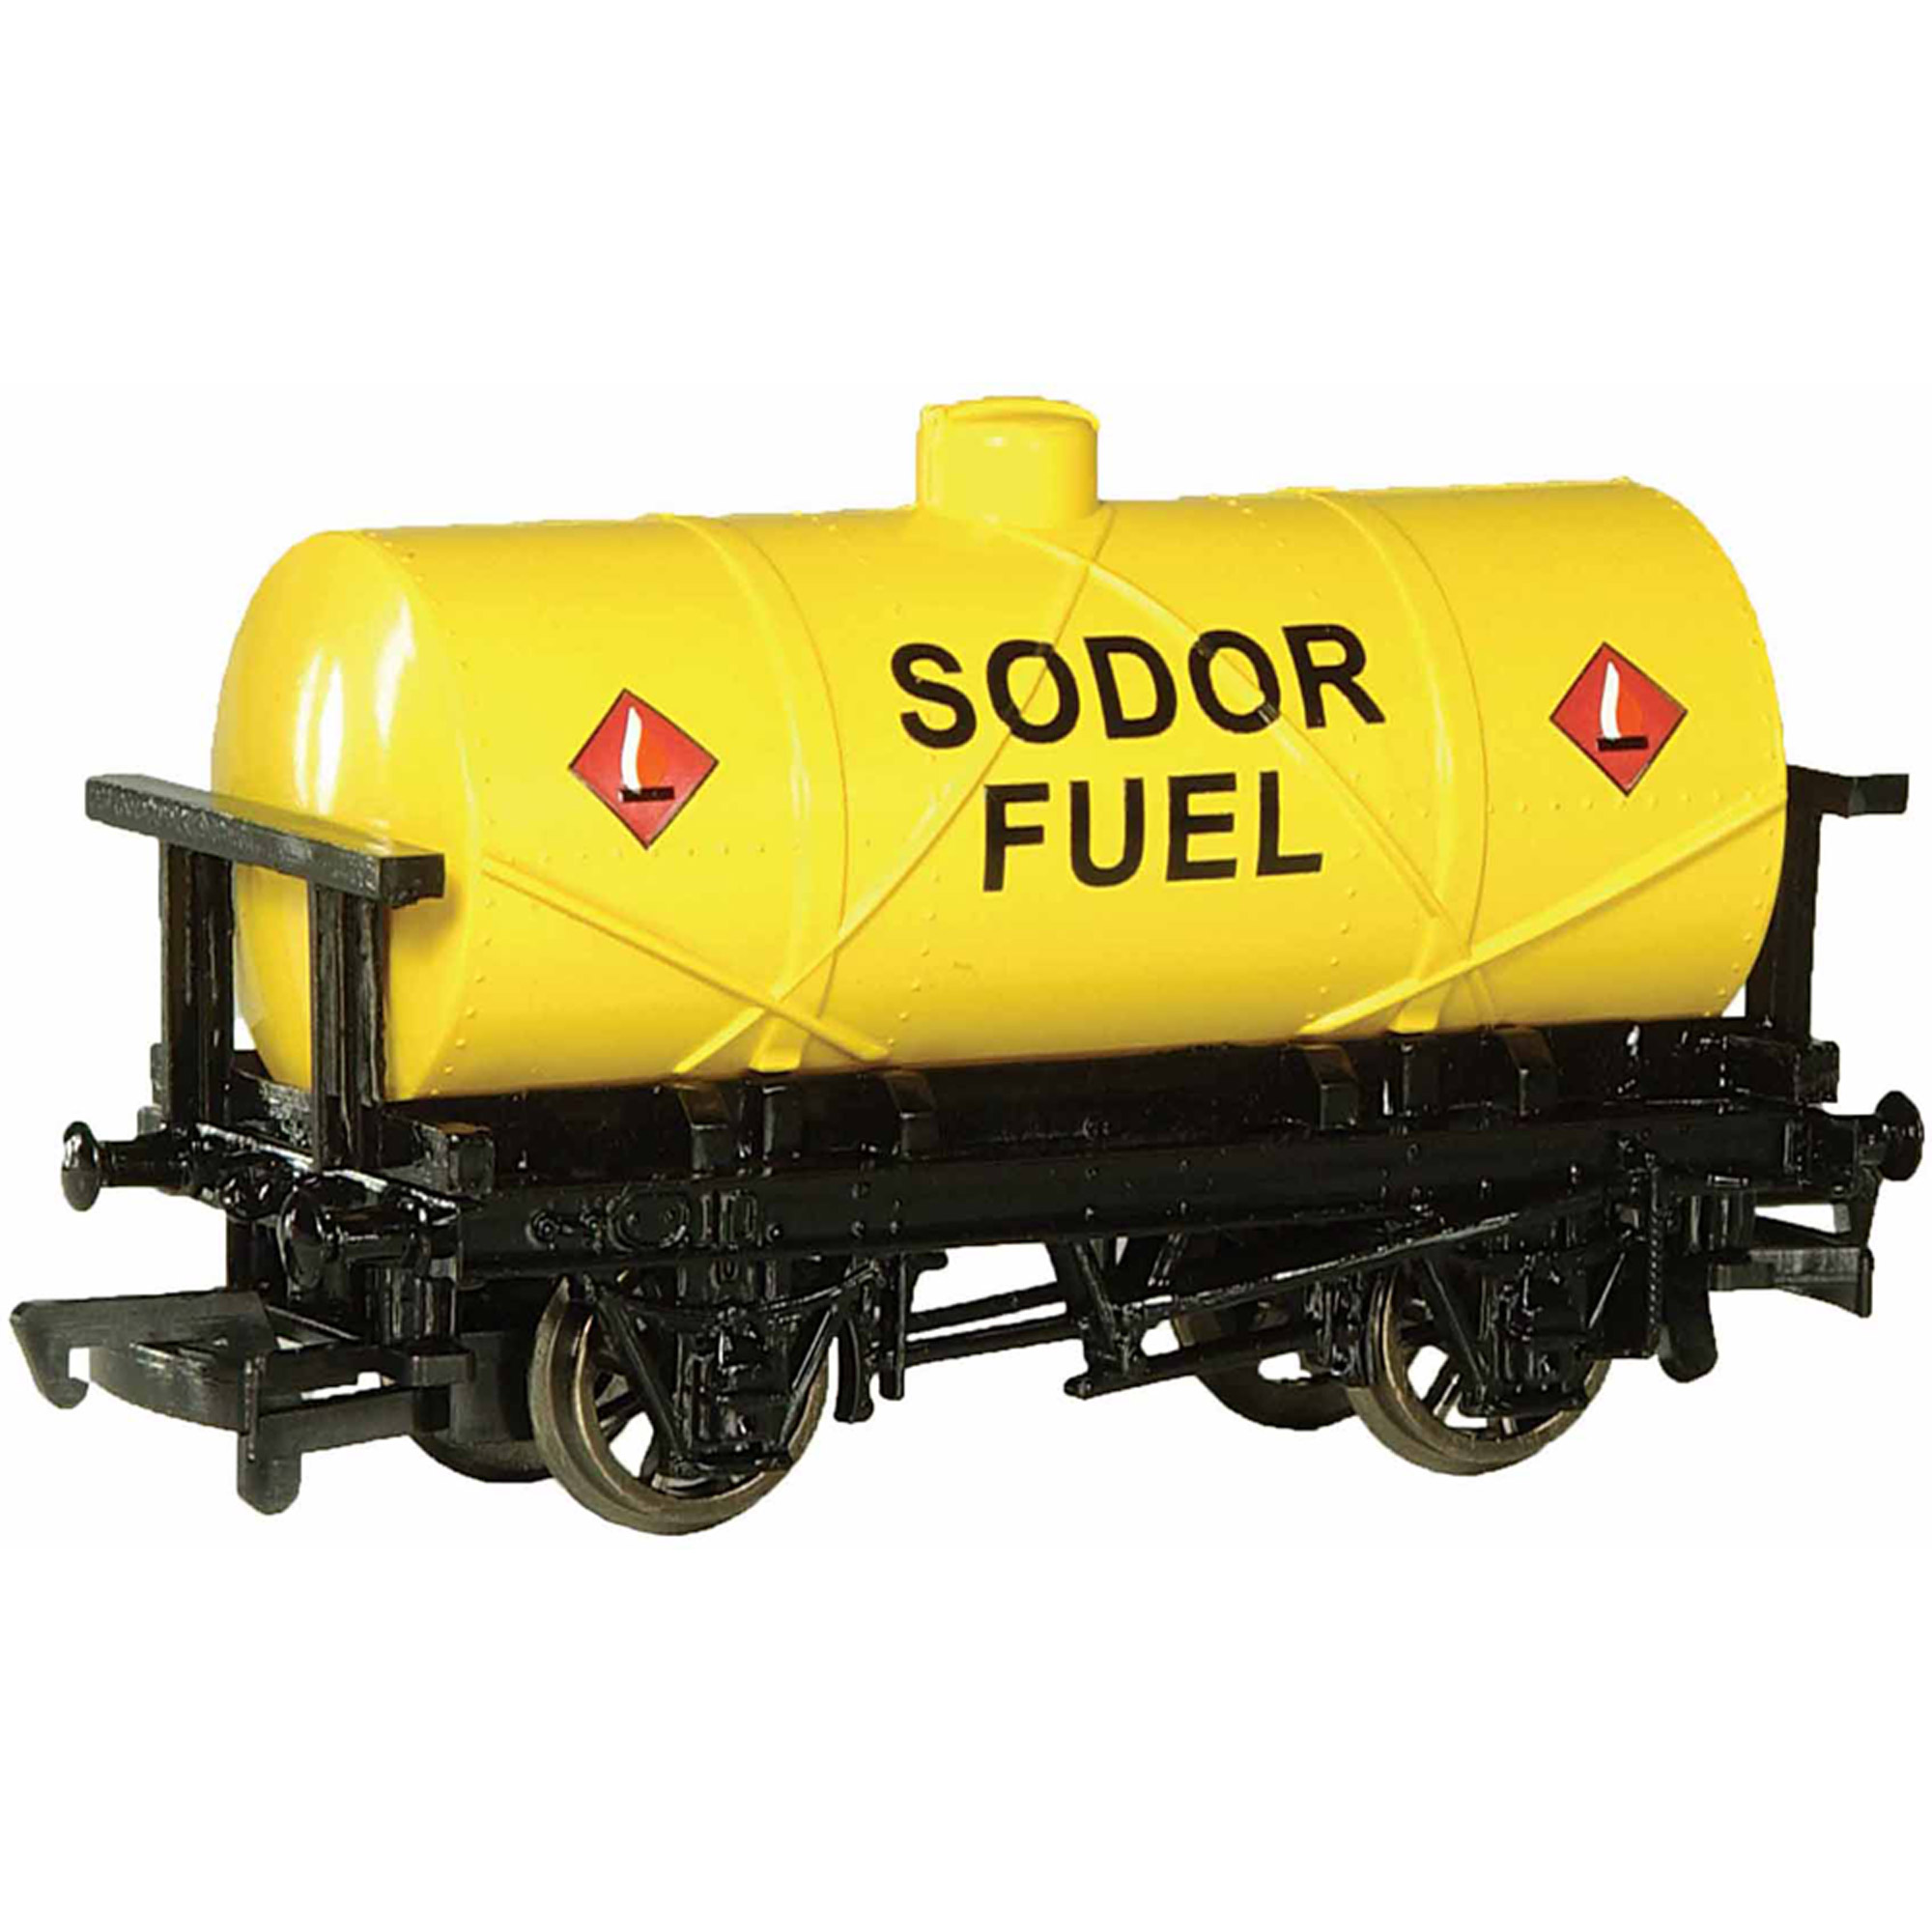 Bachmann Trains Thomas and Friends Sodor Fuel Tank, HO Scale Train